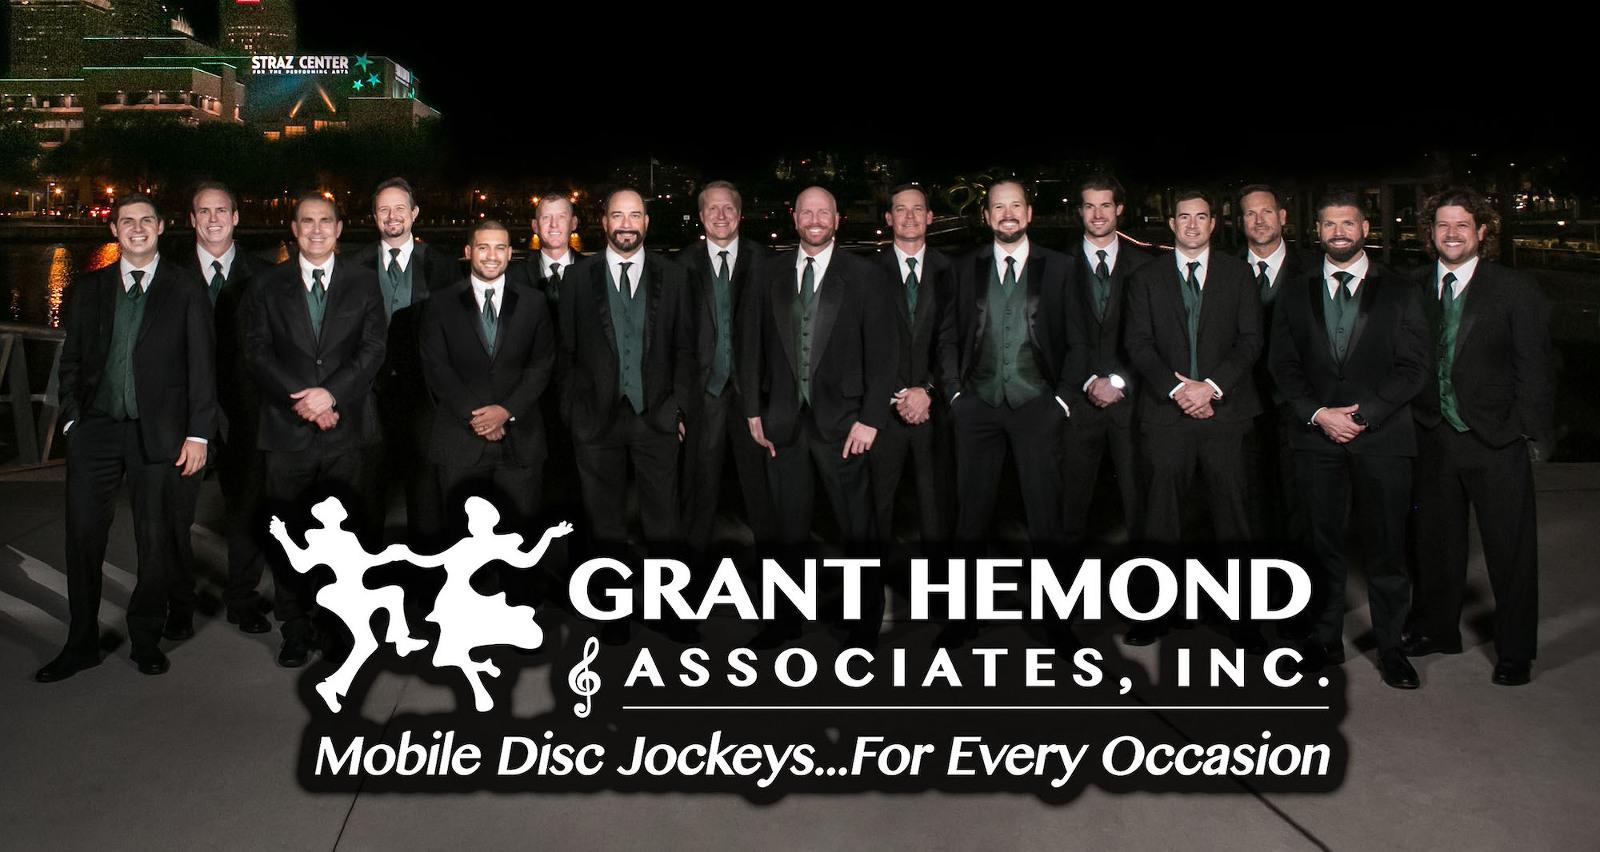 Grant Hemond and Associates   Tampa Bay Wedding DJ